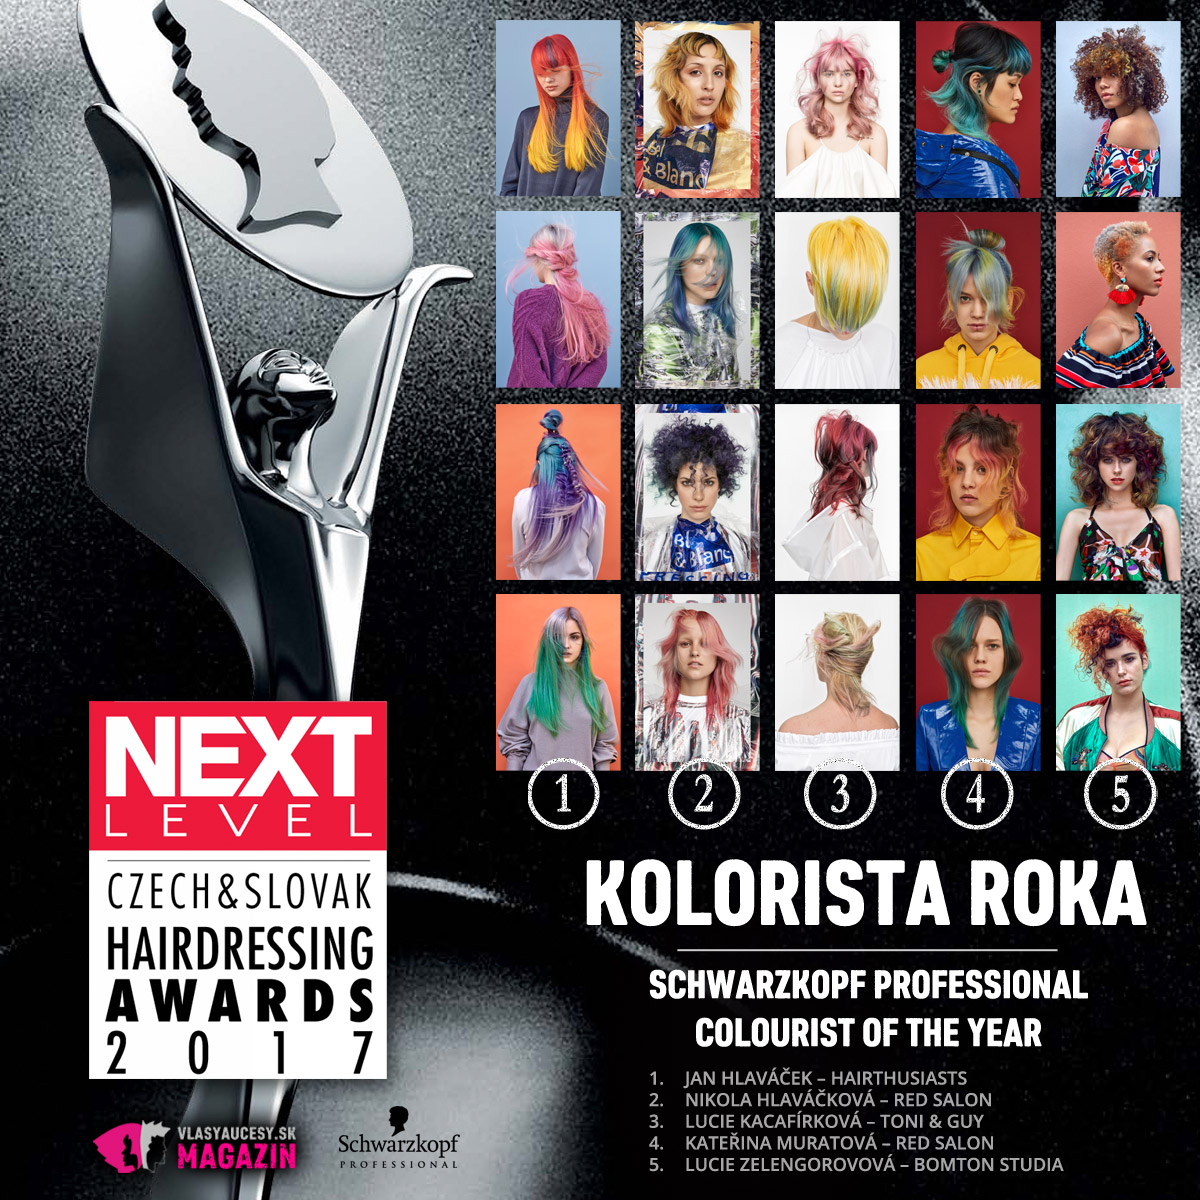 Czech&Slovak Hairdressing Awards 2017 – kategória Kolorista roka.